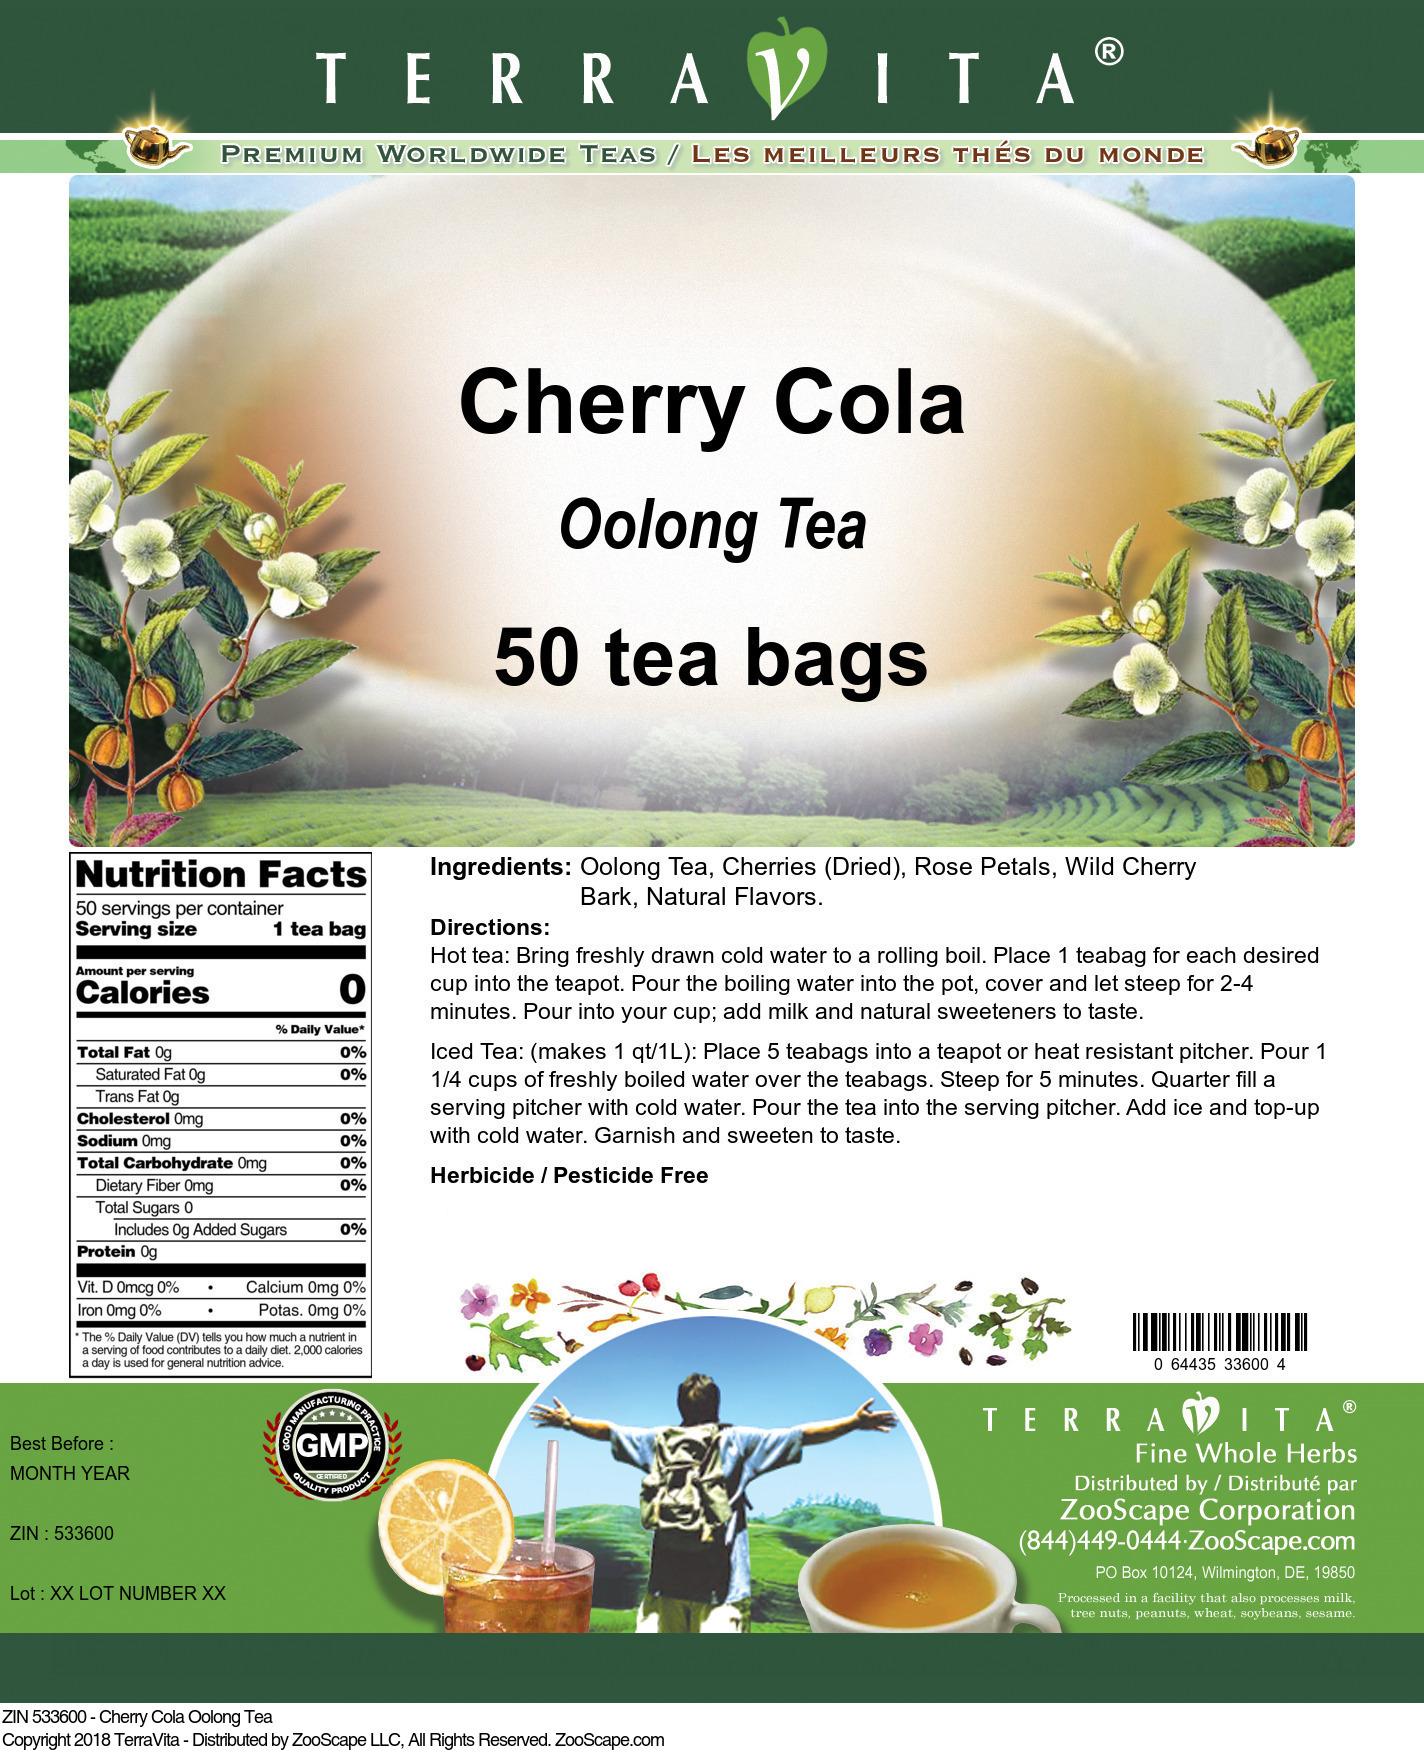 Cherry Cola Oolong Tea